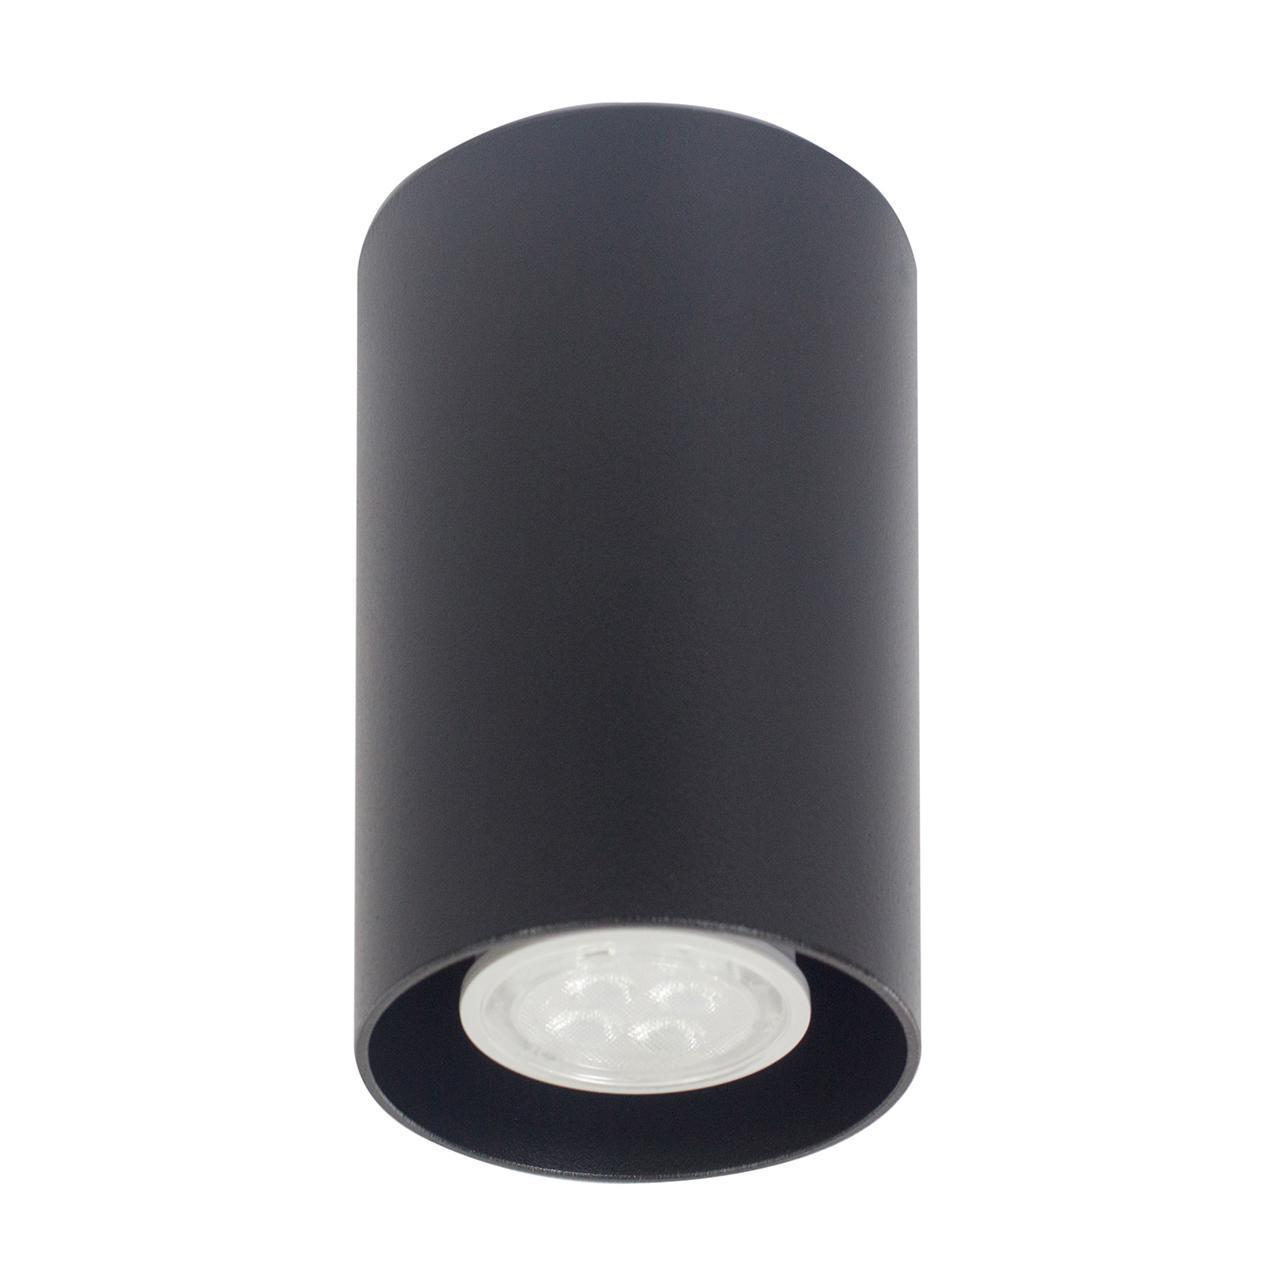 светильник артпром tubo6 p tubo6 p1 12 Потолочный светильник Артпром Tubo6 P1 12